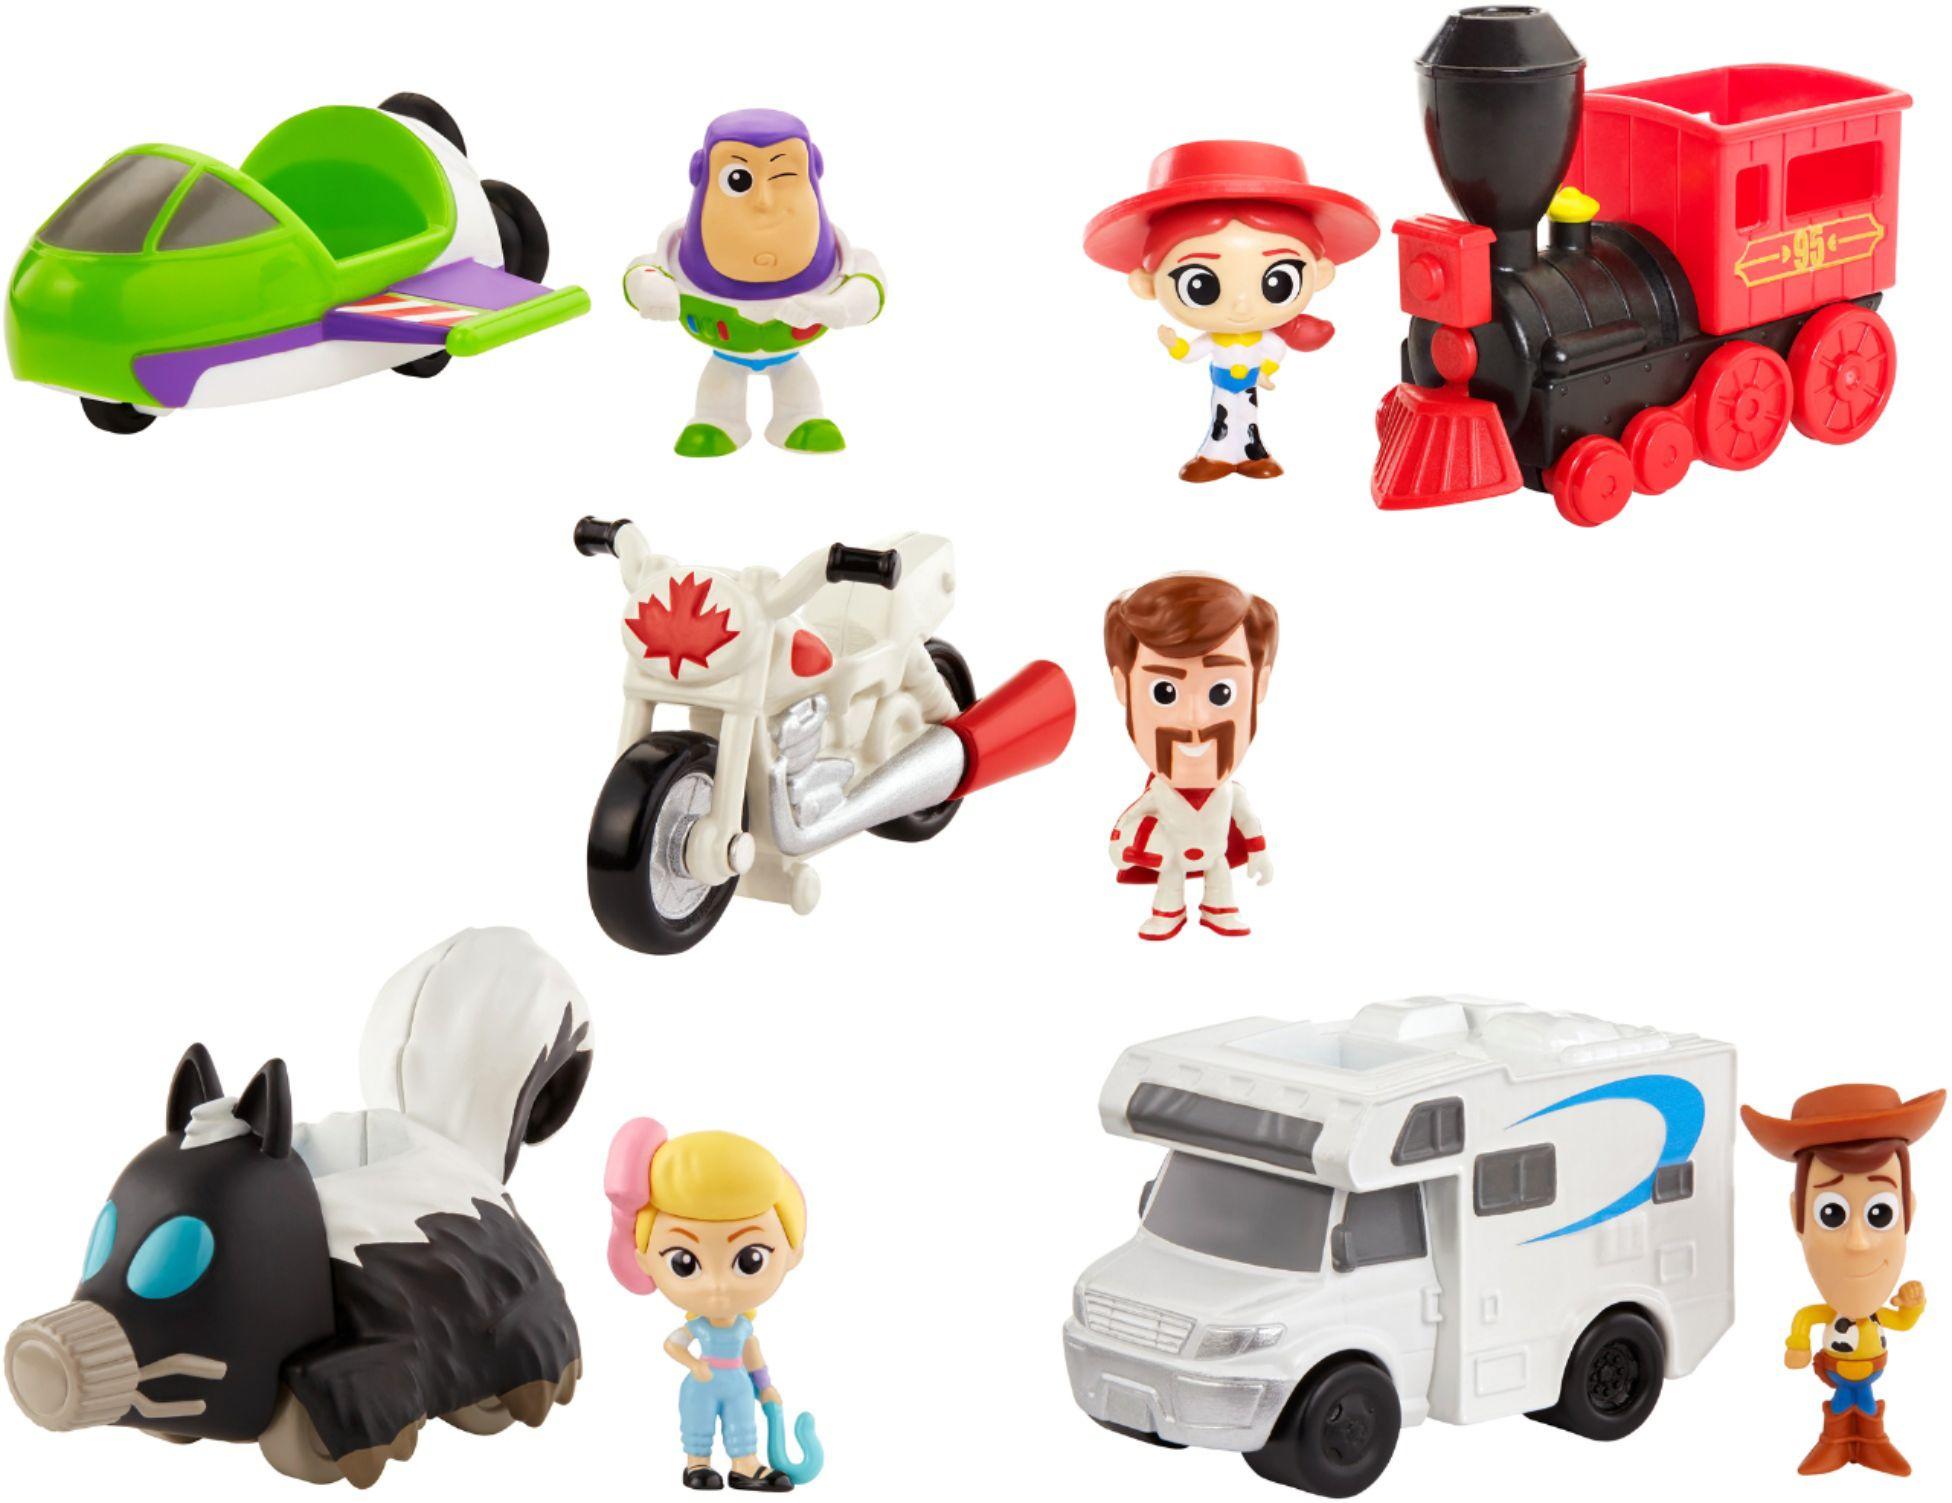 Disney Pixar Toy Story 4 Mini Figure with Vehicle (Various Styles) $3 at Best Buy w/ Free Curbside Pickup